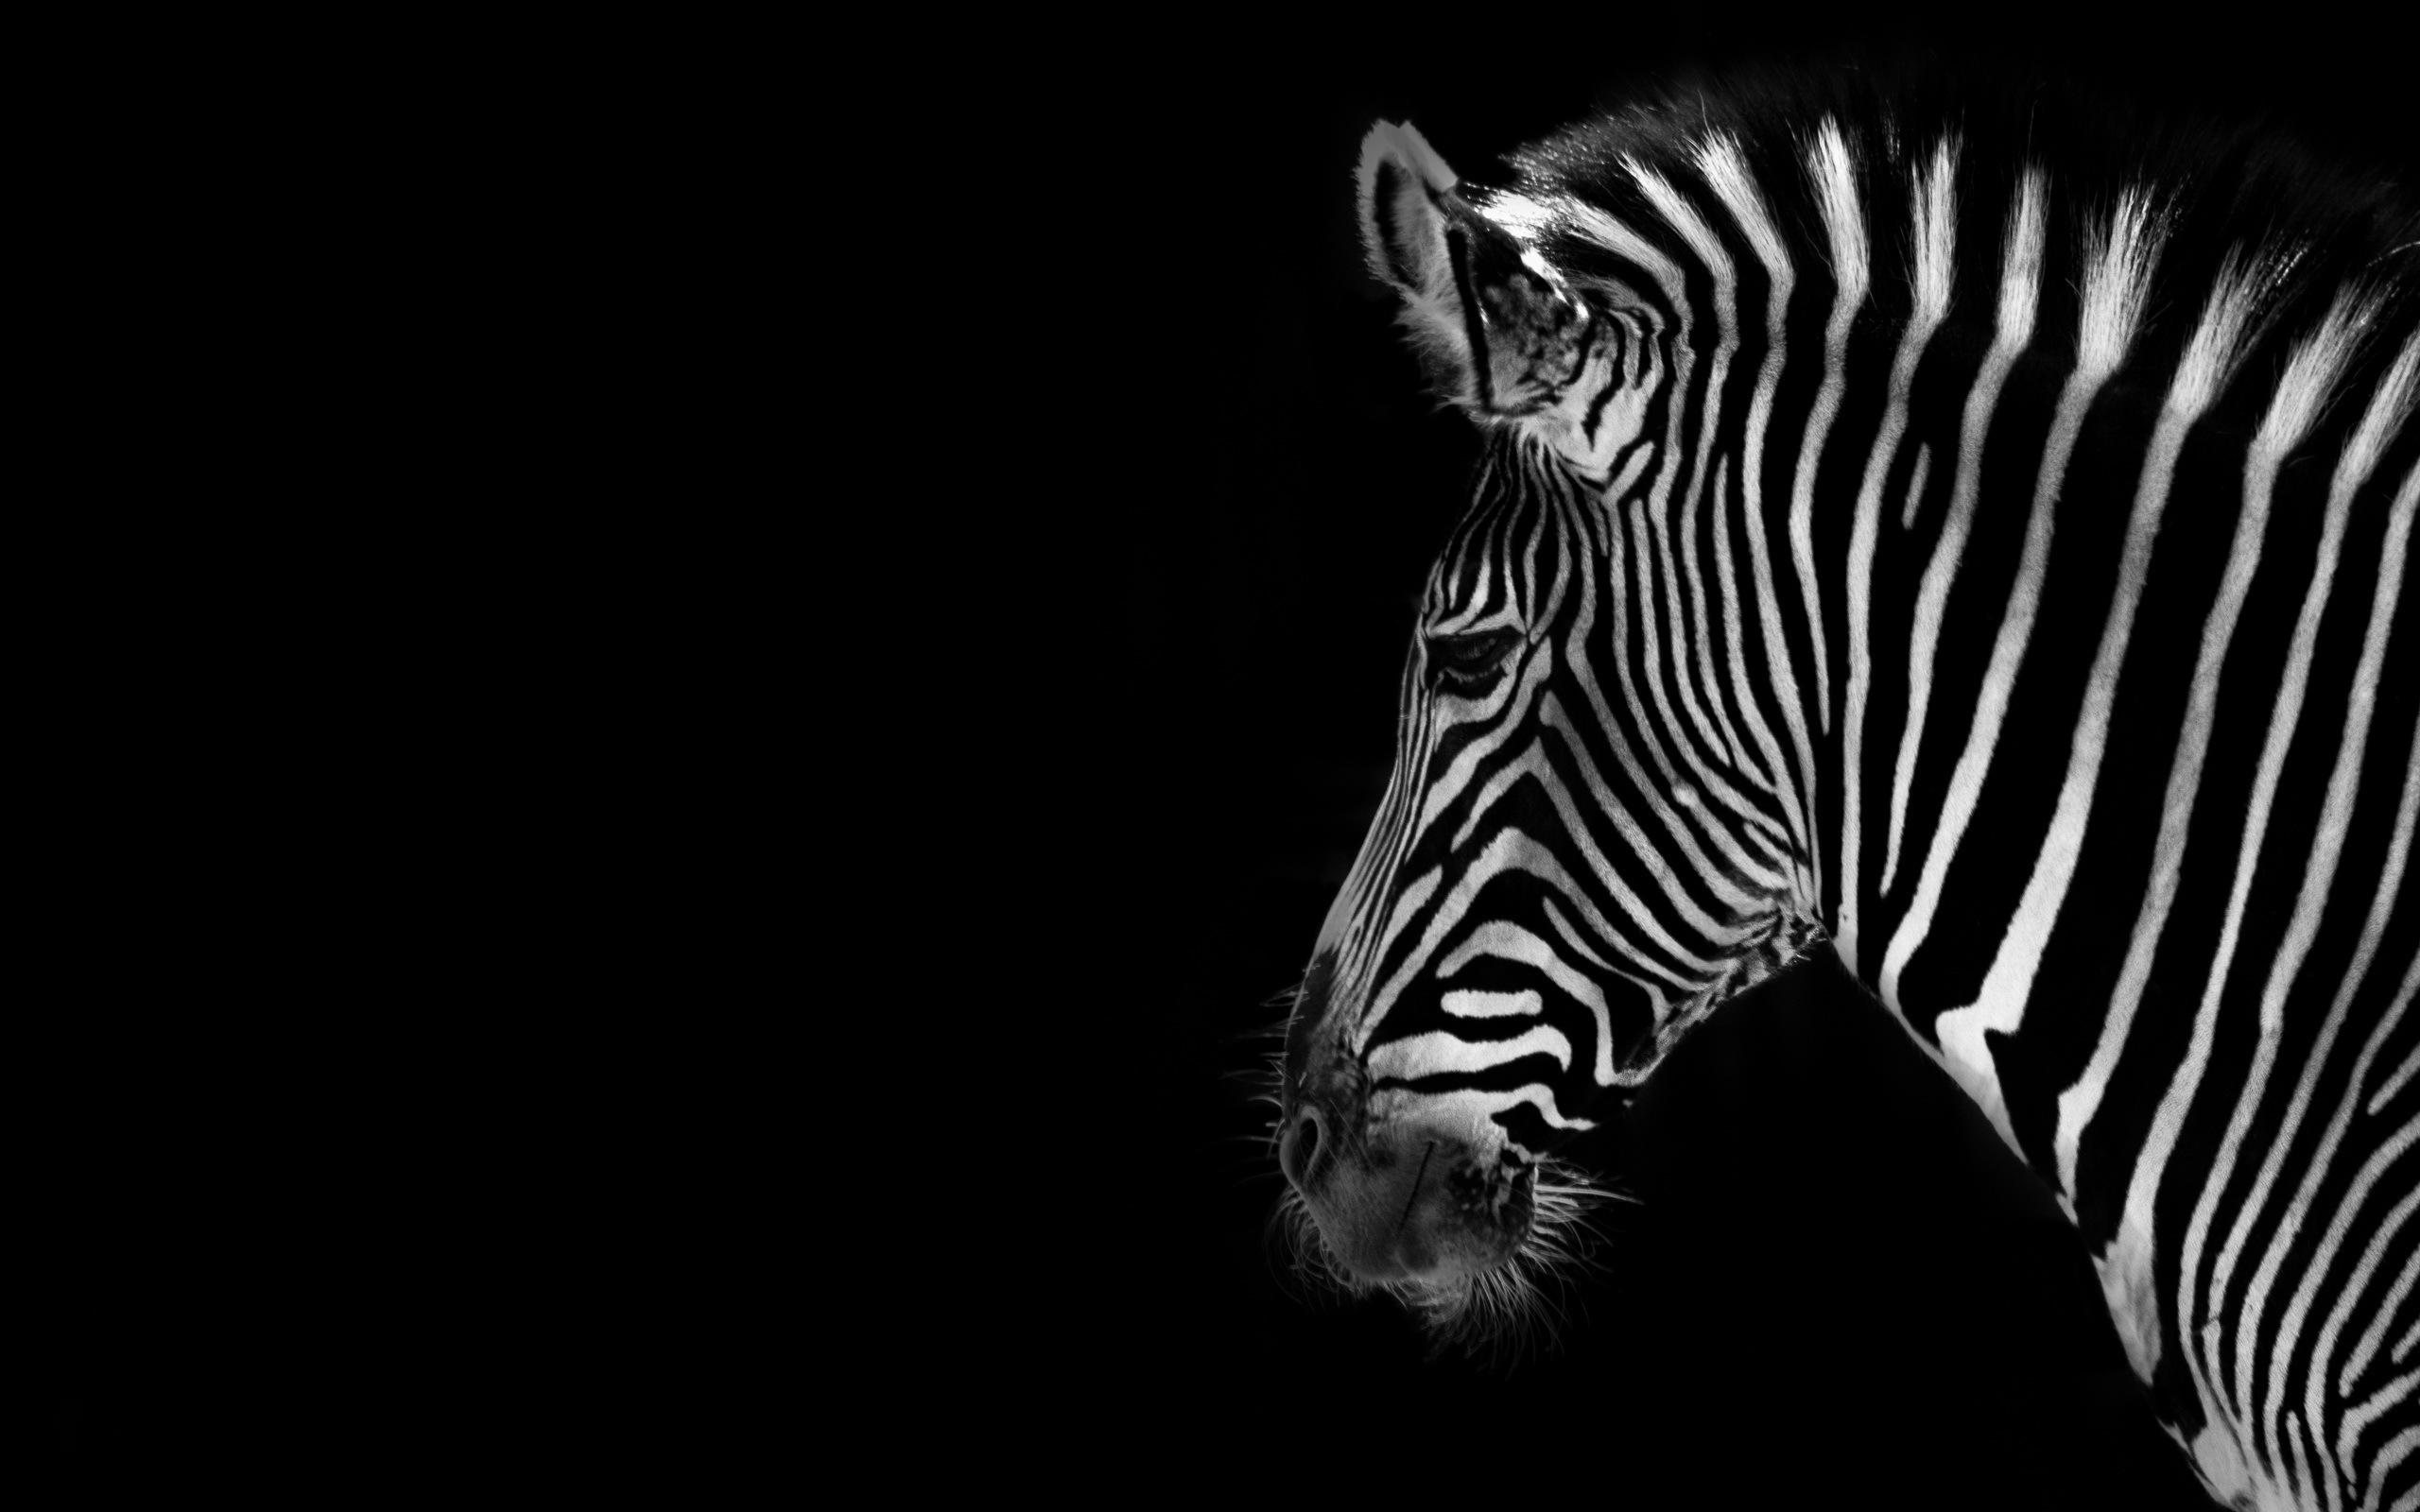 Zebra Computer Backgrounds